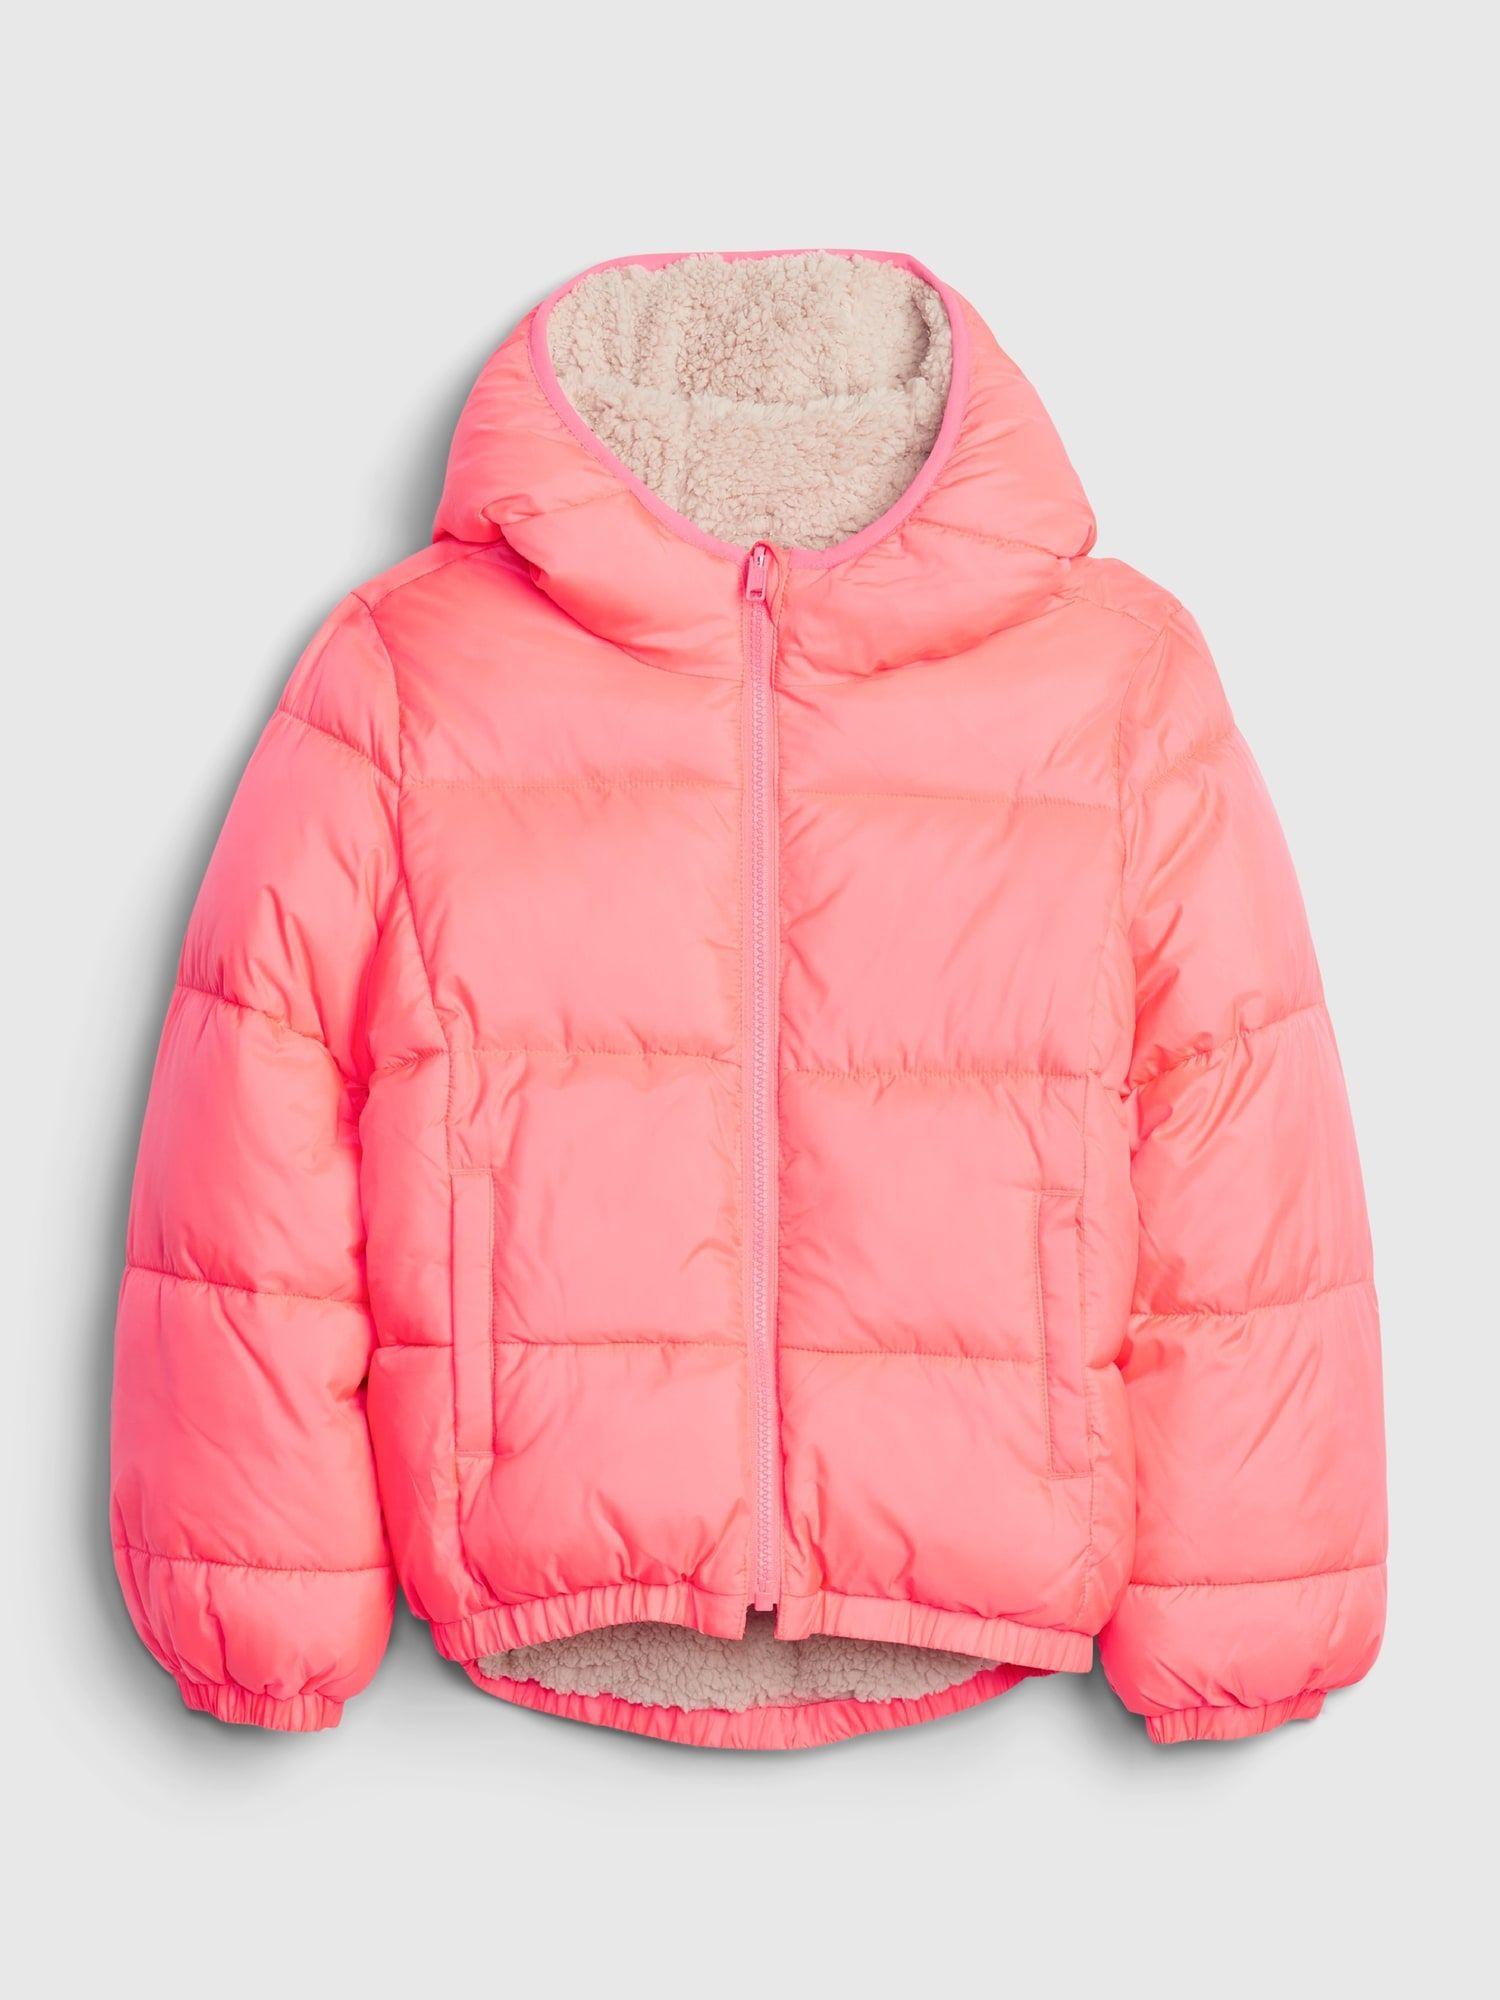 Kids Bettermade Coldcontrol Max Reversible Puffer Jacket Gap [ 2000 x 1500 Pixel ]